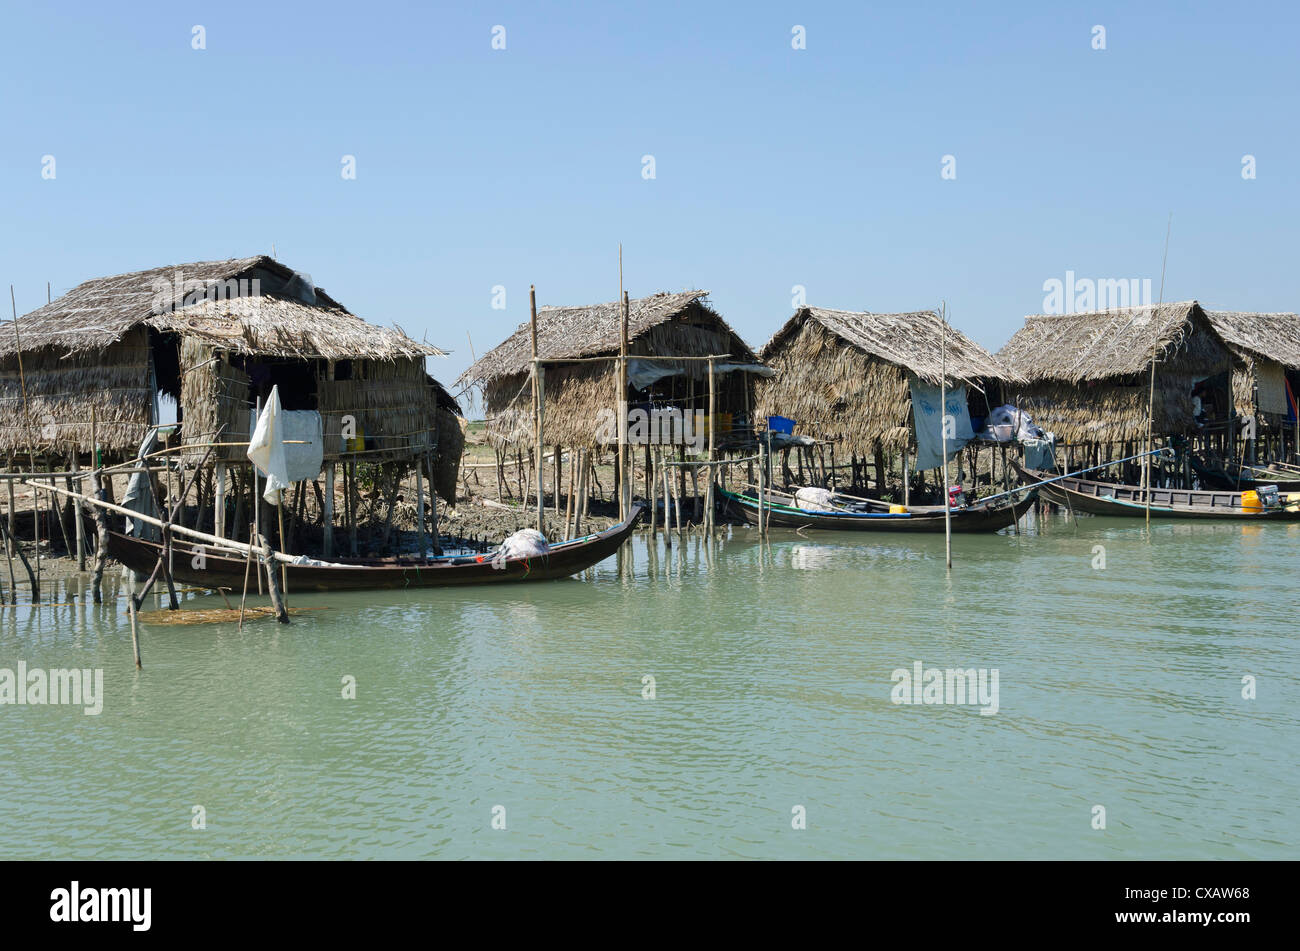 Bamboo huts and boats along a waterway, Irrawaddy delta, Myanmar (Burma), Asia - Stock Image